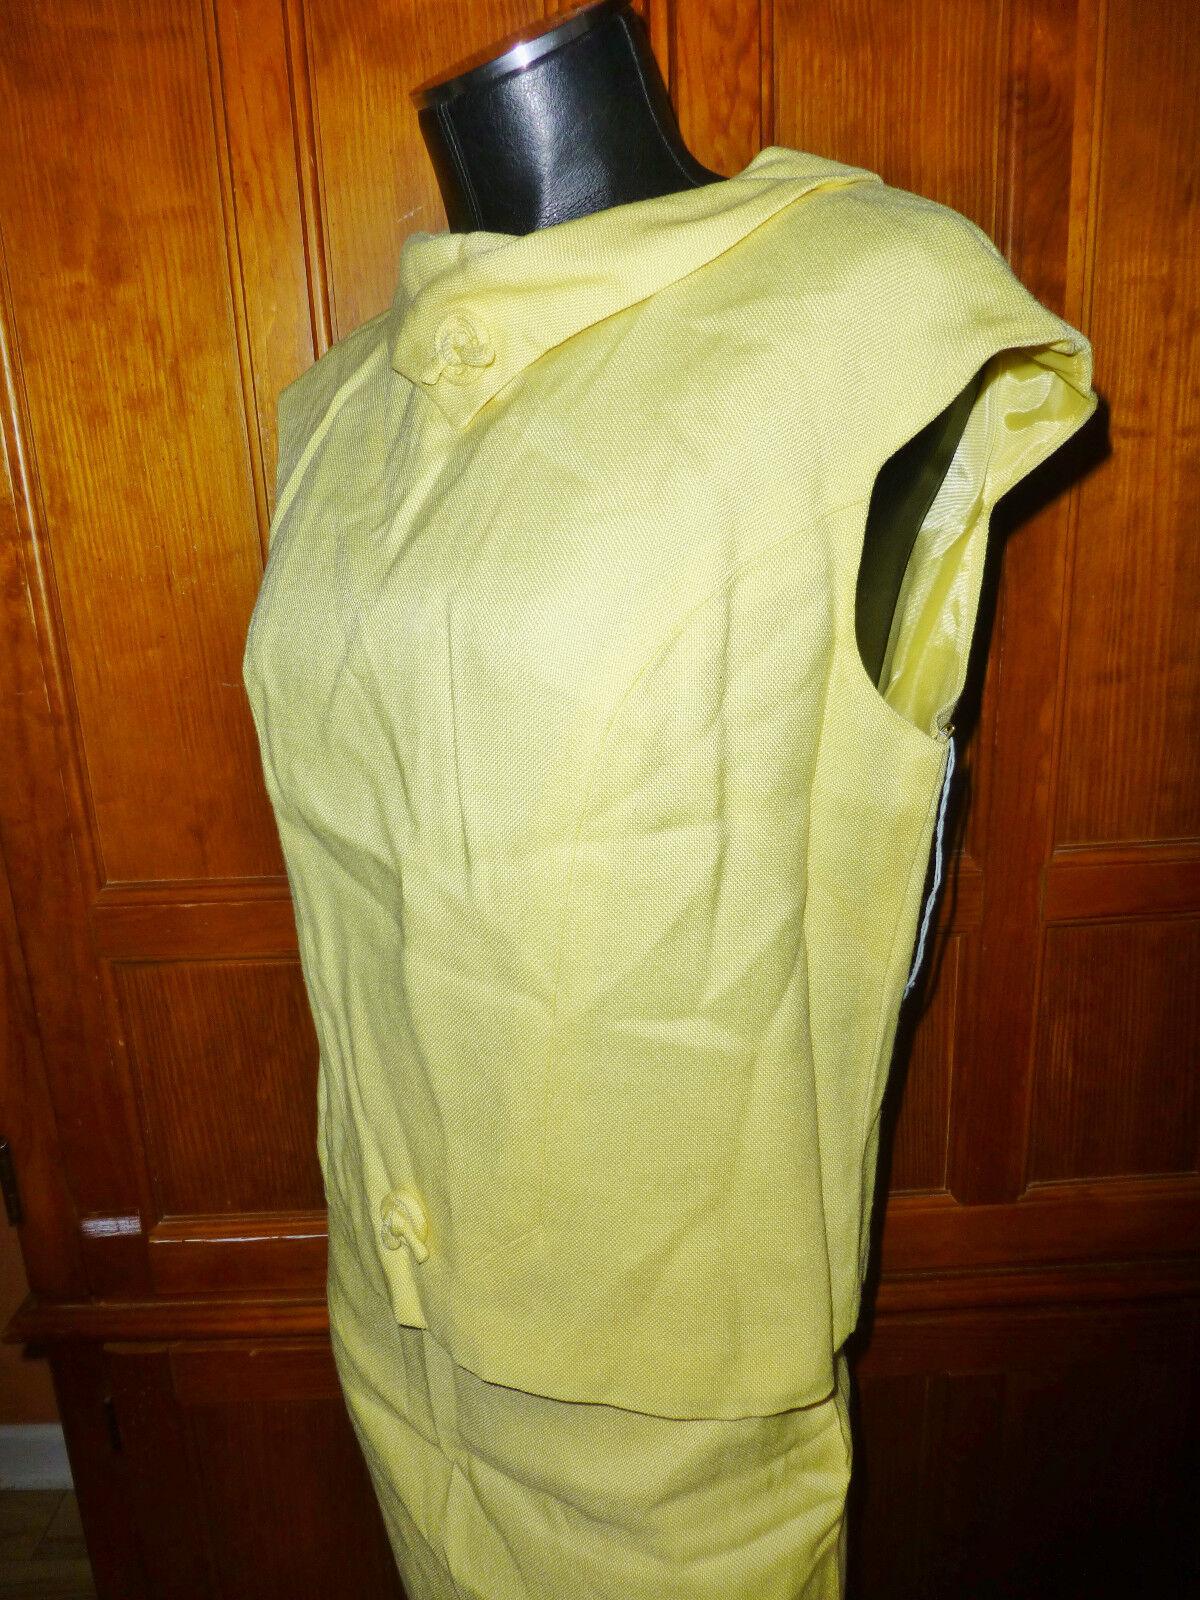 NOS Vtg 60s MOD pure Linen Yellow Yellow Yellow 2pc dress SKIRT Blouse Top SET 76a4a8